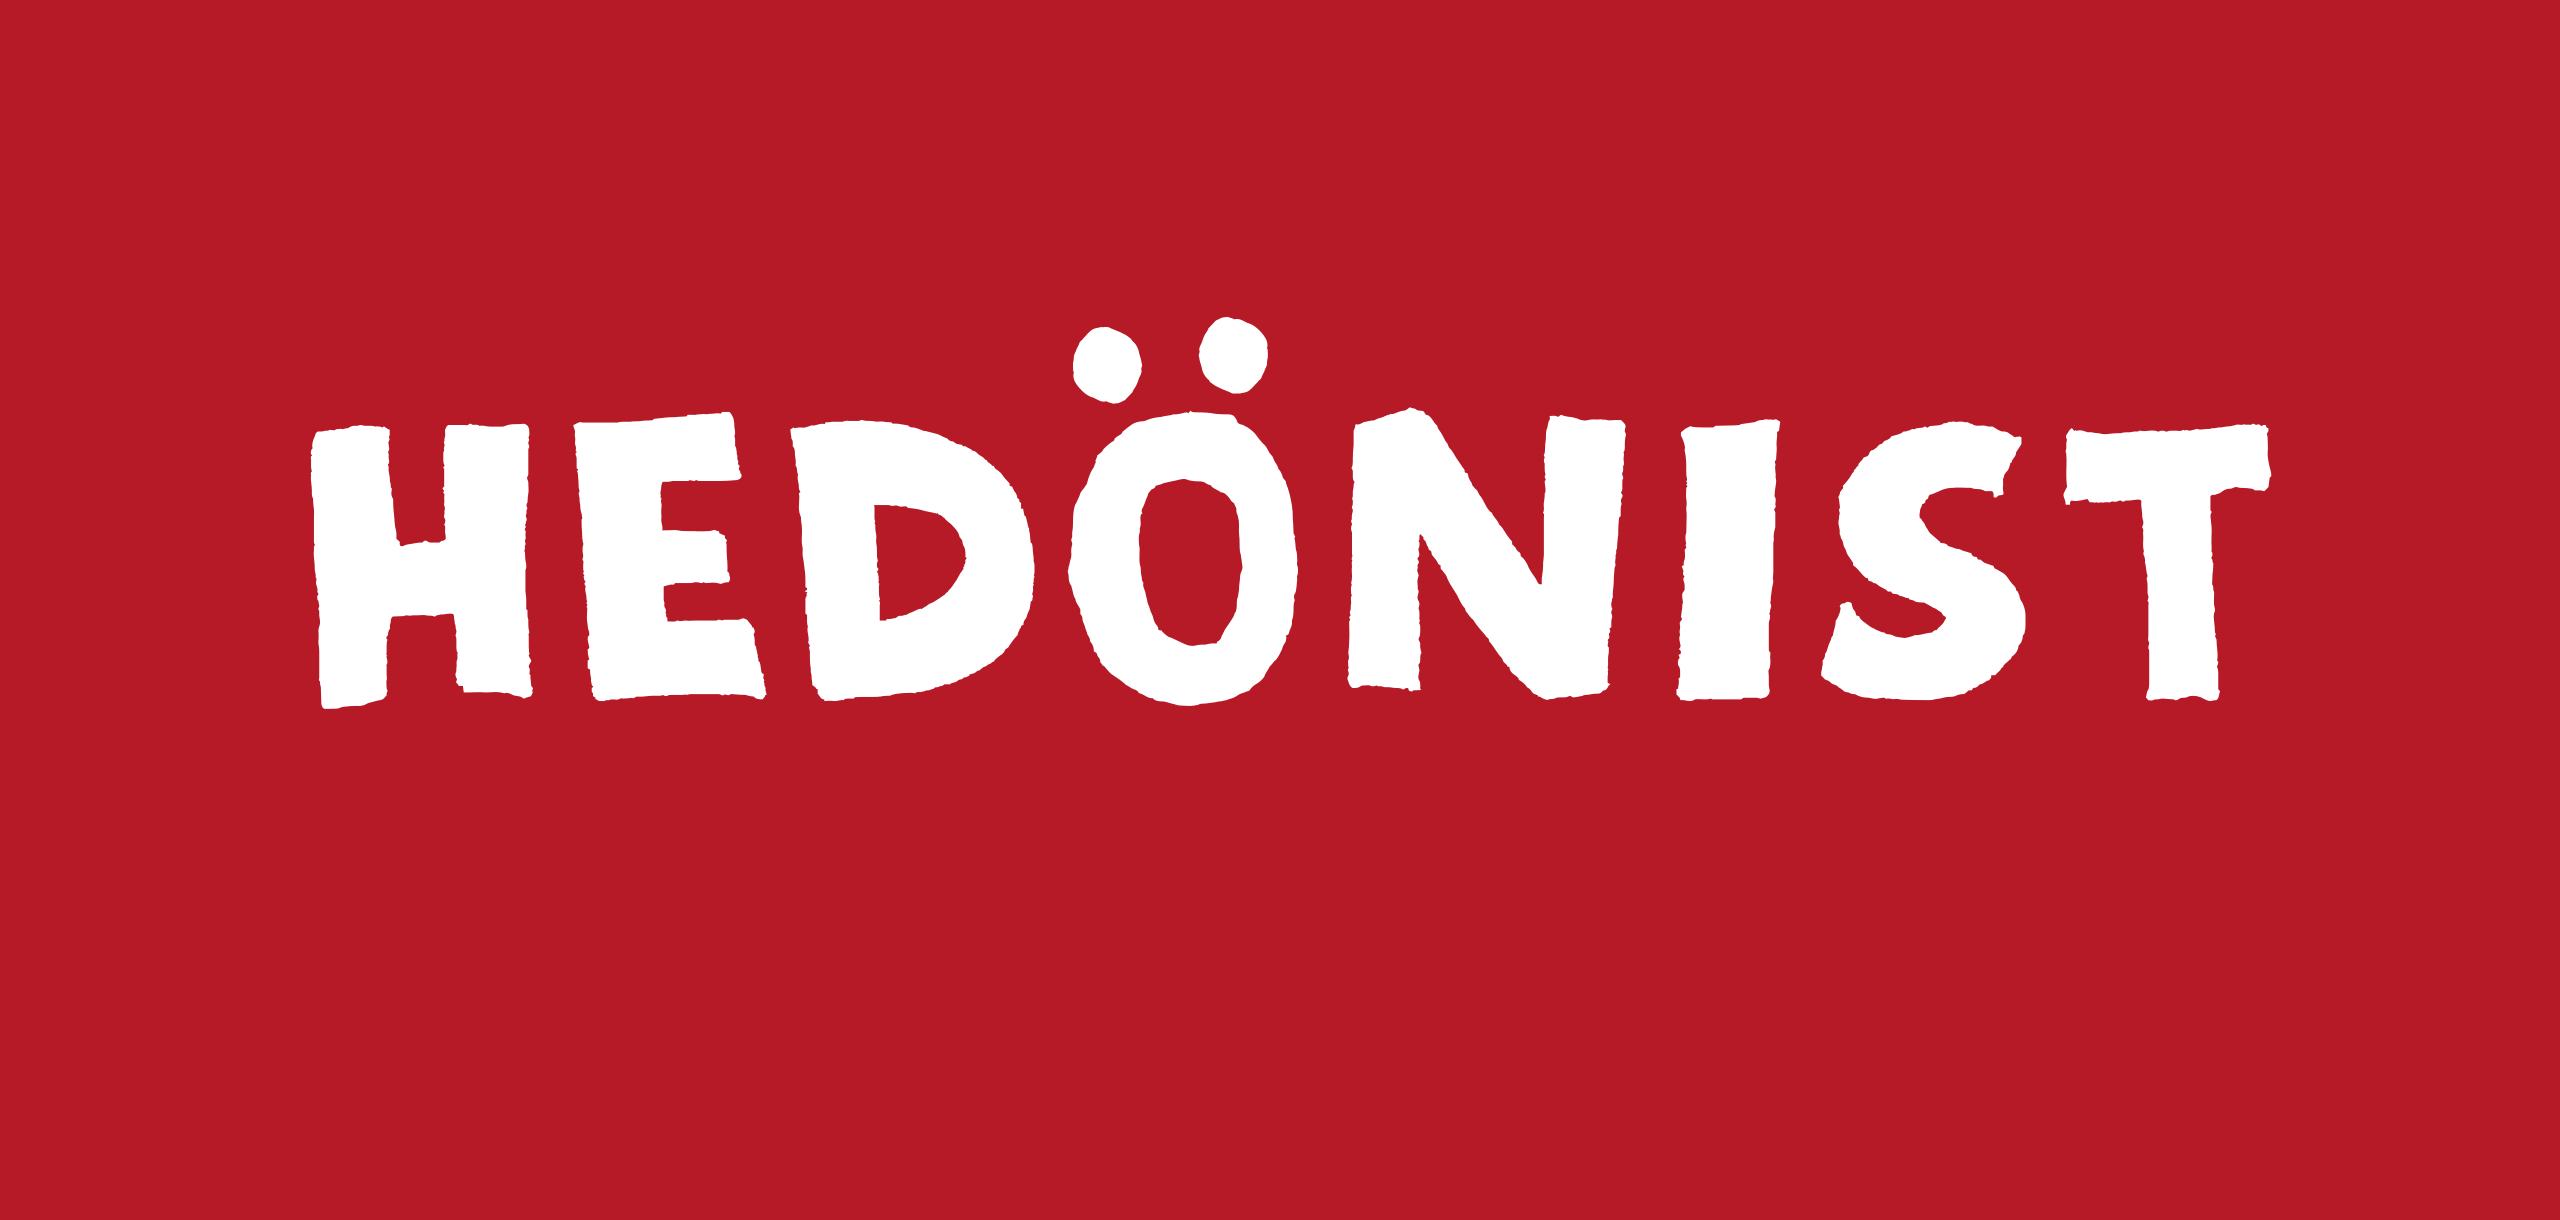 Hedonist-1-1